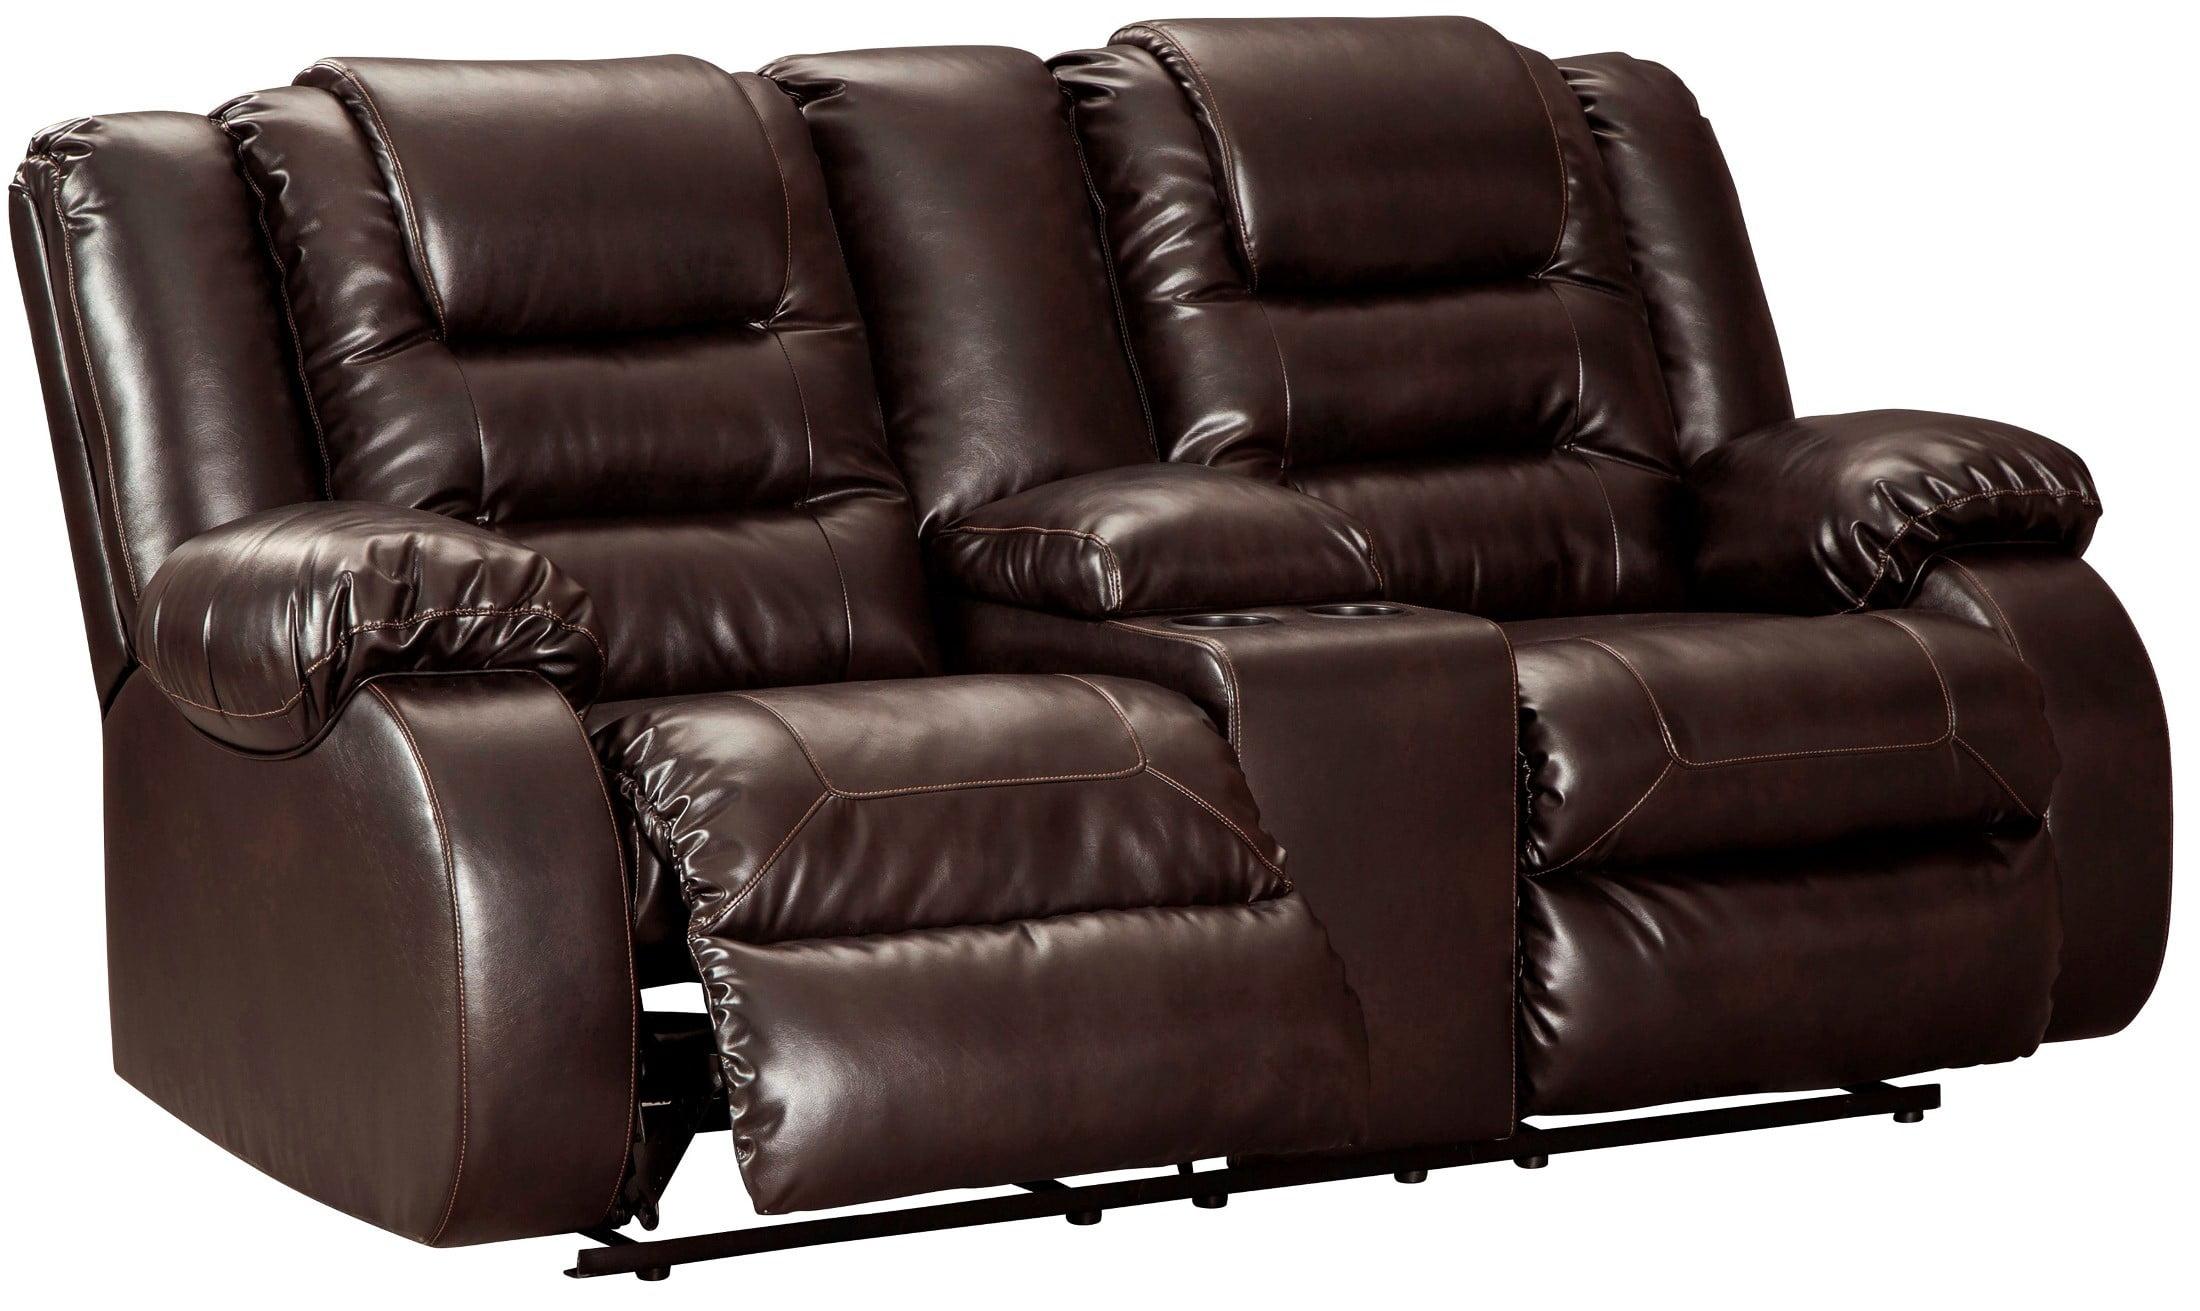 Astounding Vacherie Chocolate Double Reclining Loveseat Inzonedesignstudio Interior Chair Design Inzonedesignstudiocom